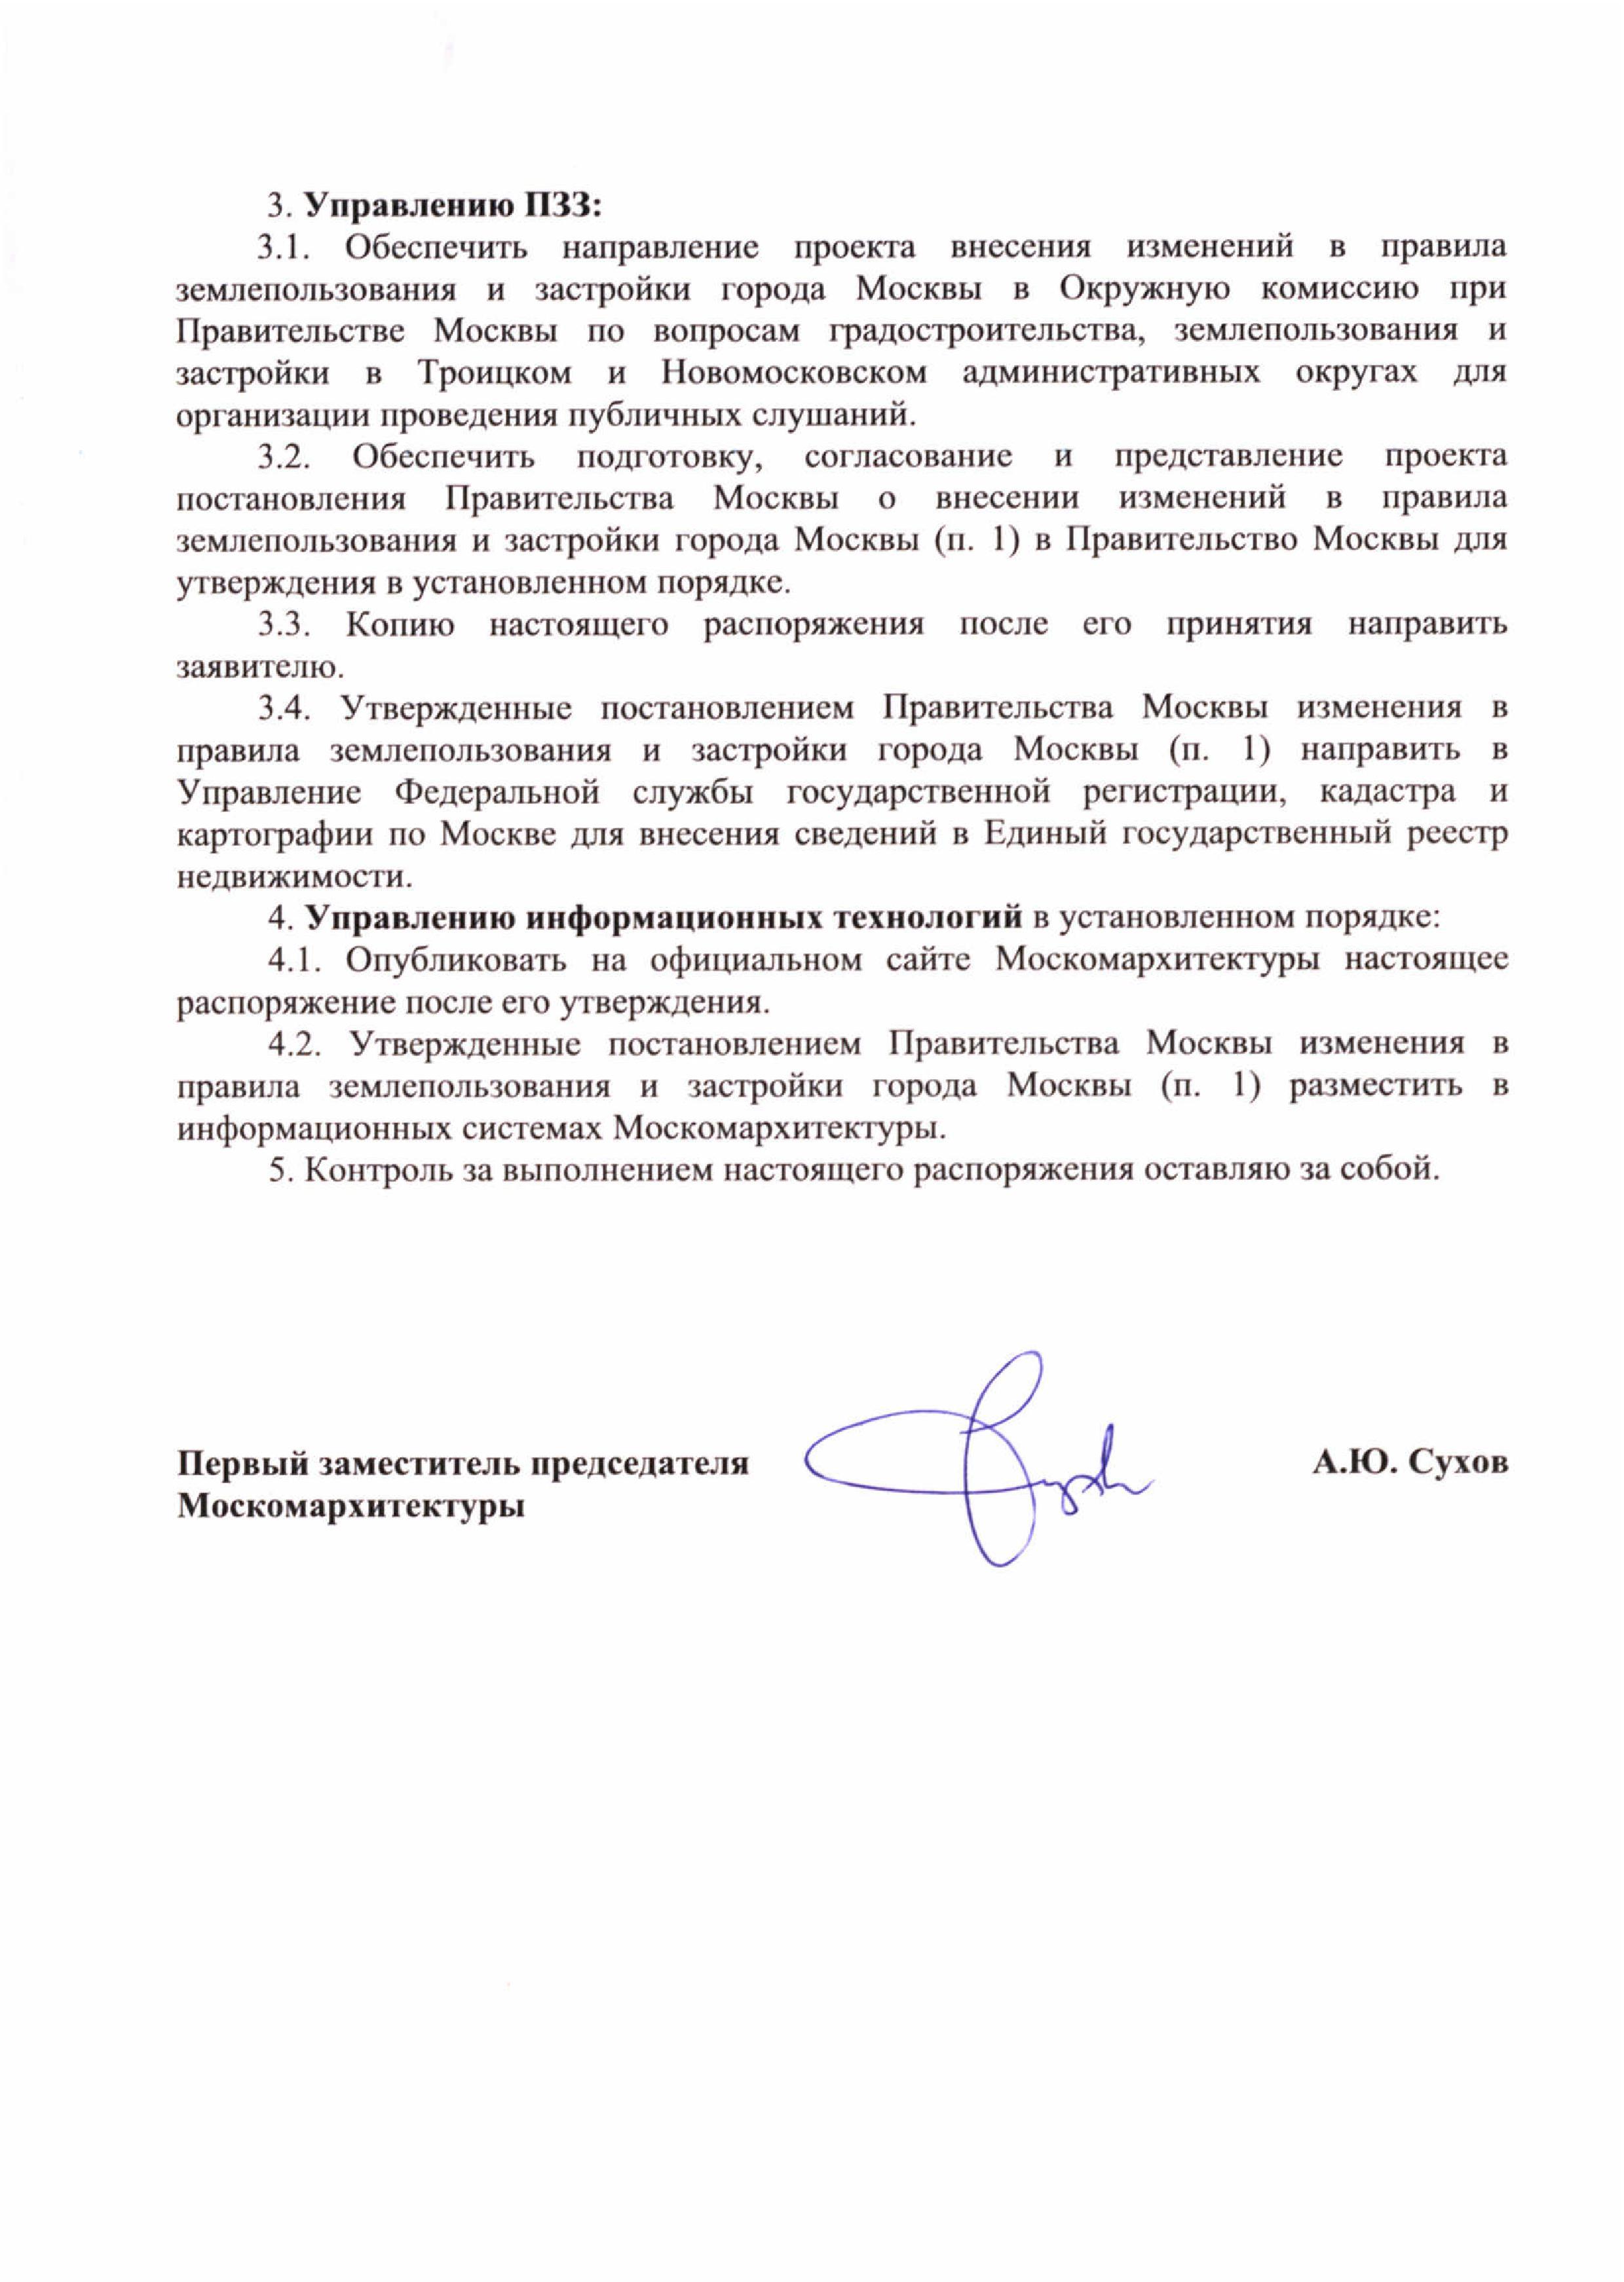 rpmka_2018_0443_page_002.jpg